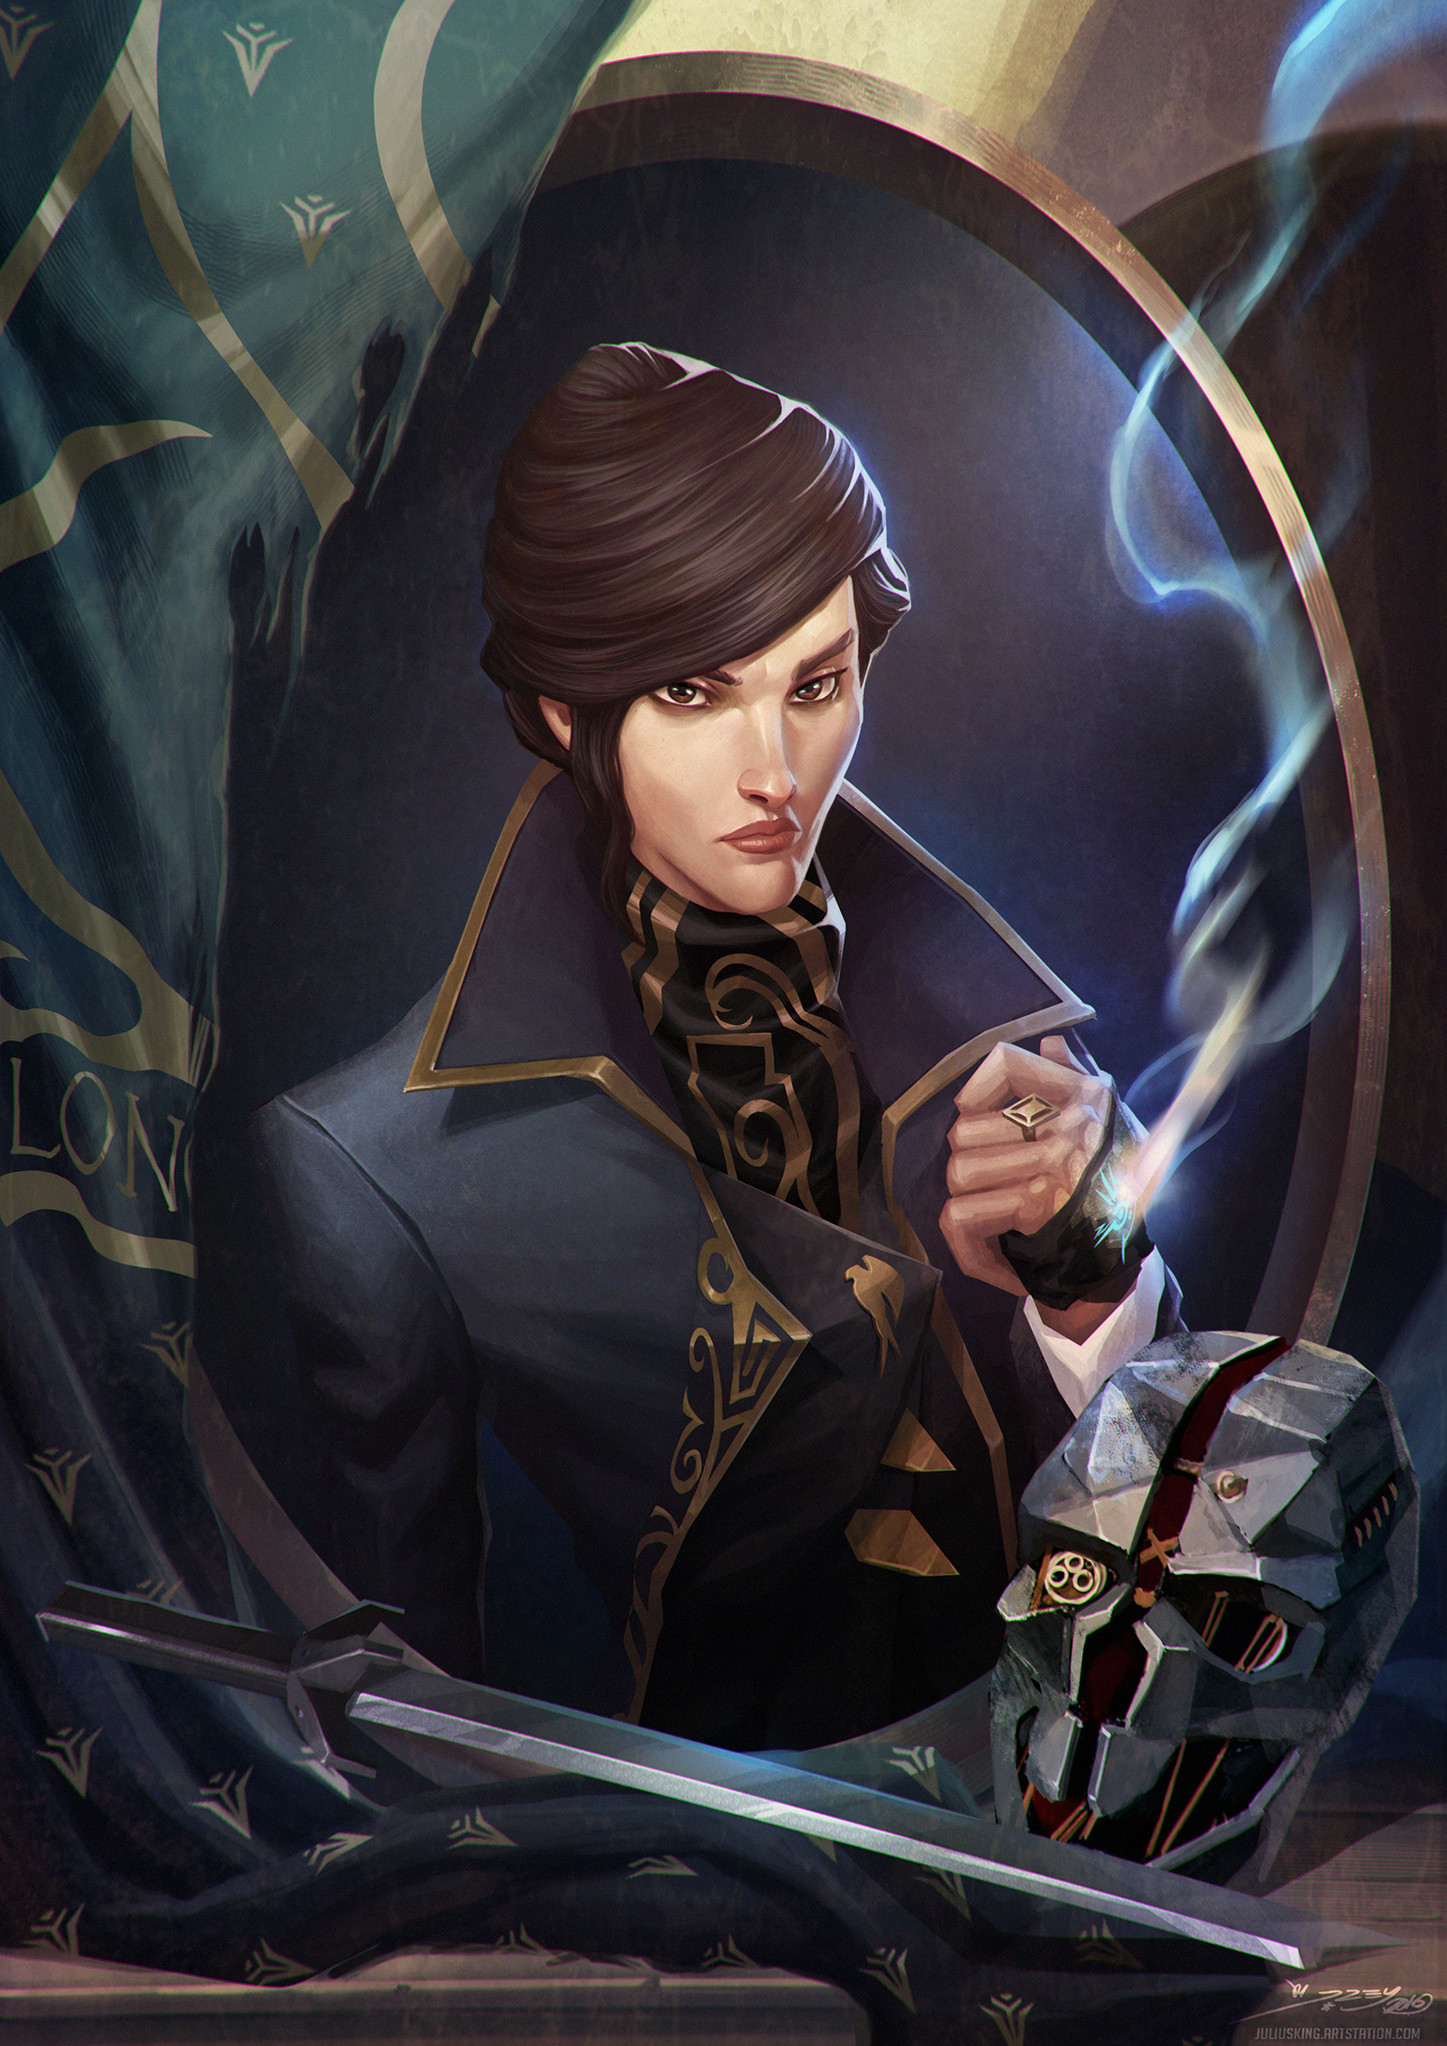 dishonored 2 art id